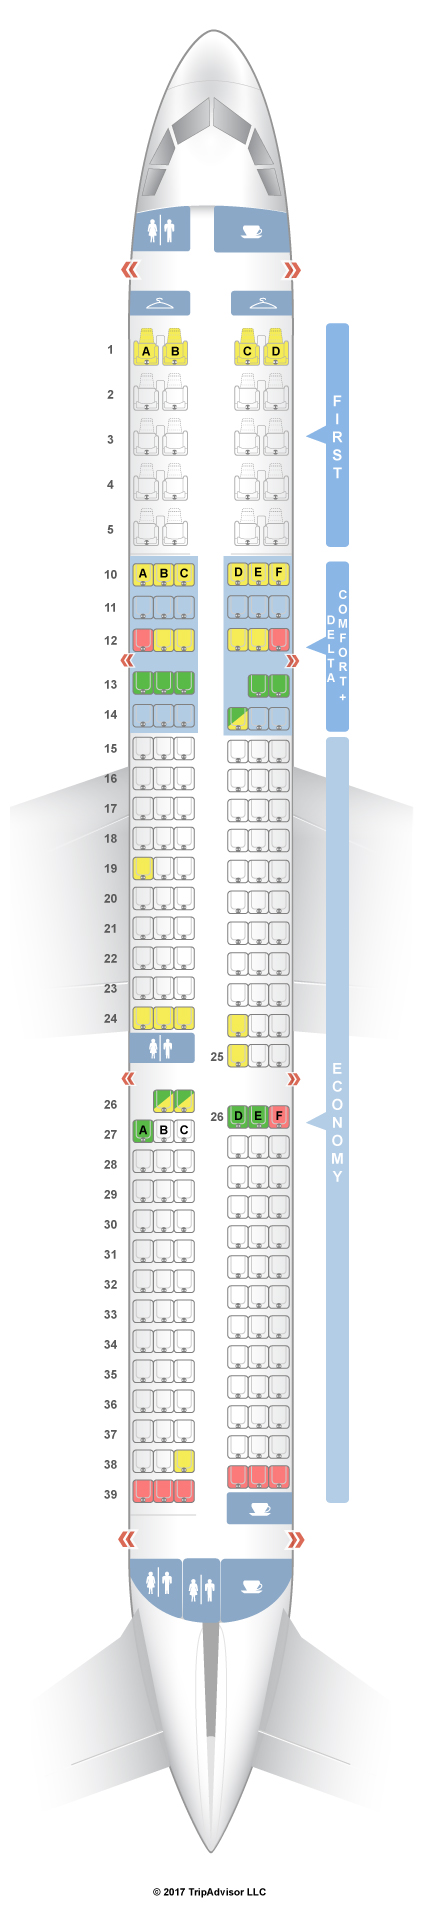 SeatGuru Seat Map Delta Airbus A - Us airways a321 seat map